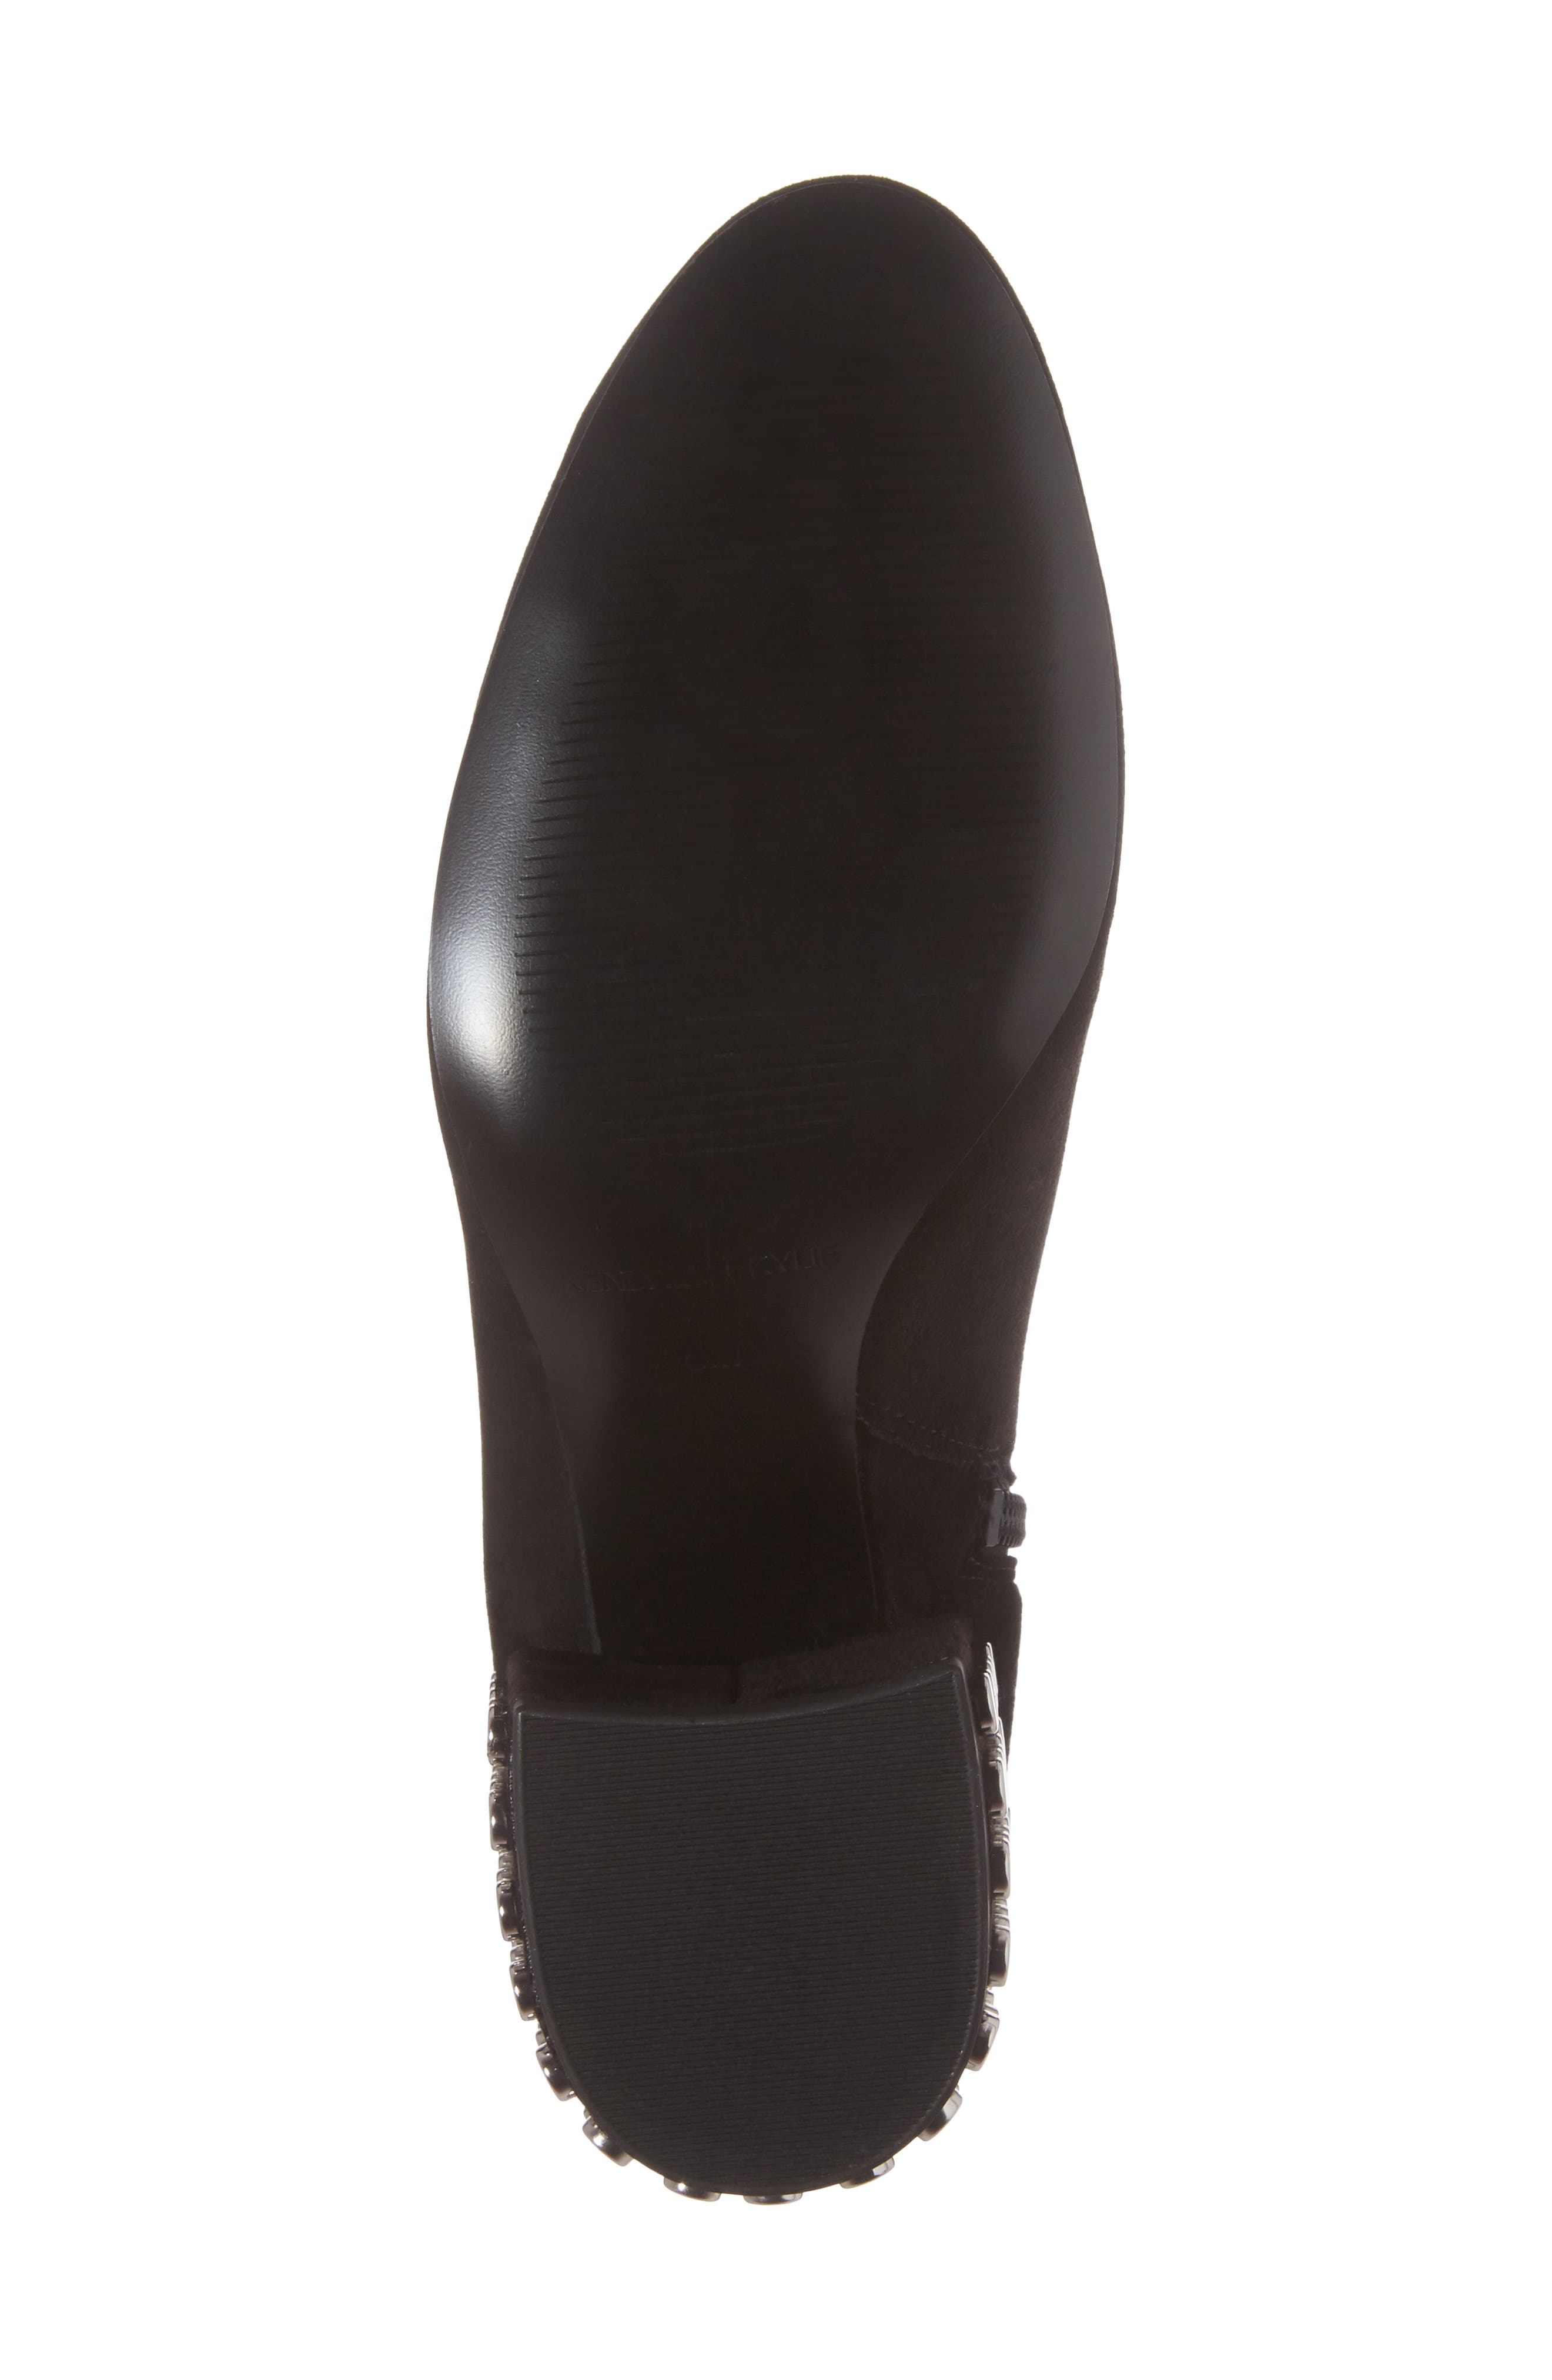 Blythe Studded Heel Bootie,                             Alternate thumbnail 6, color,                             001